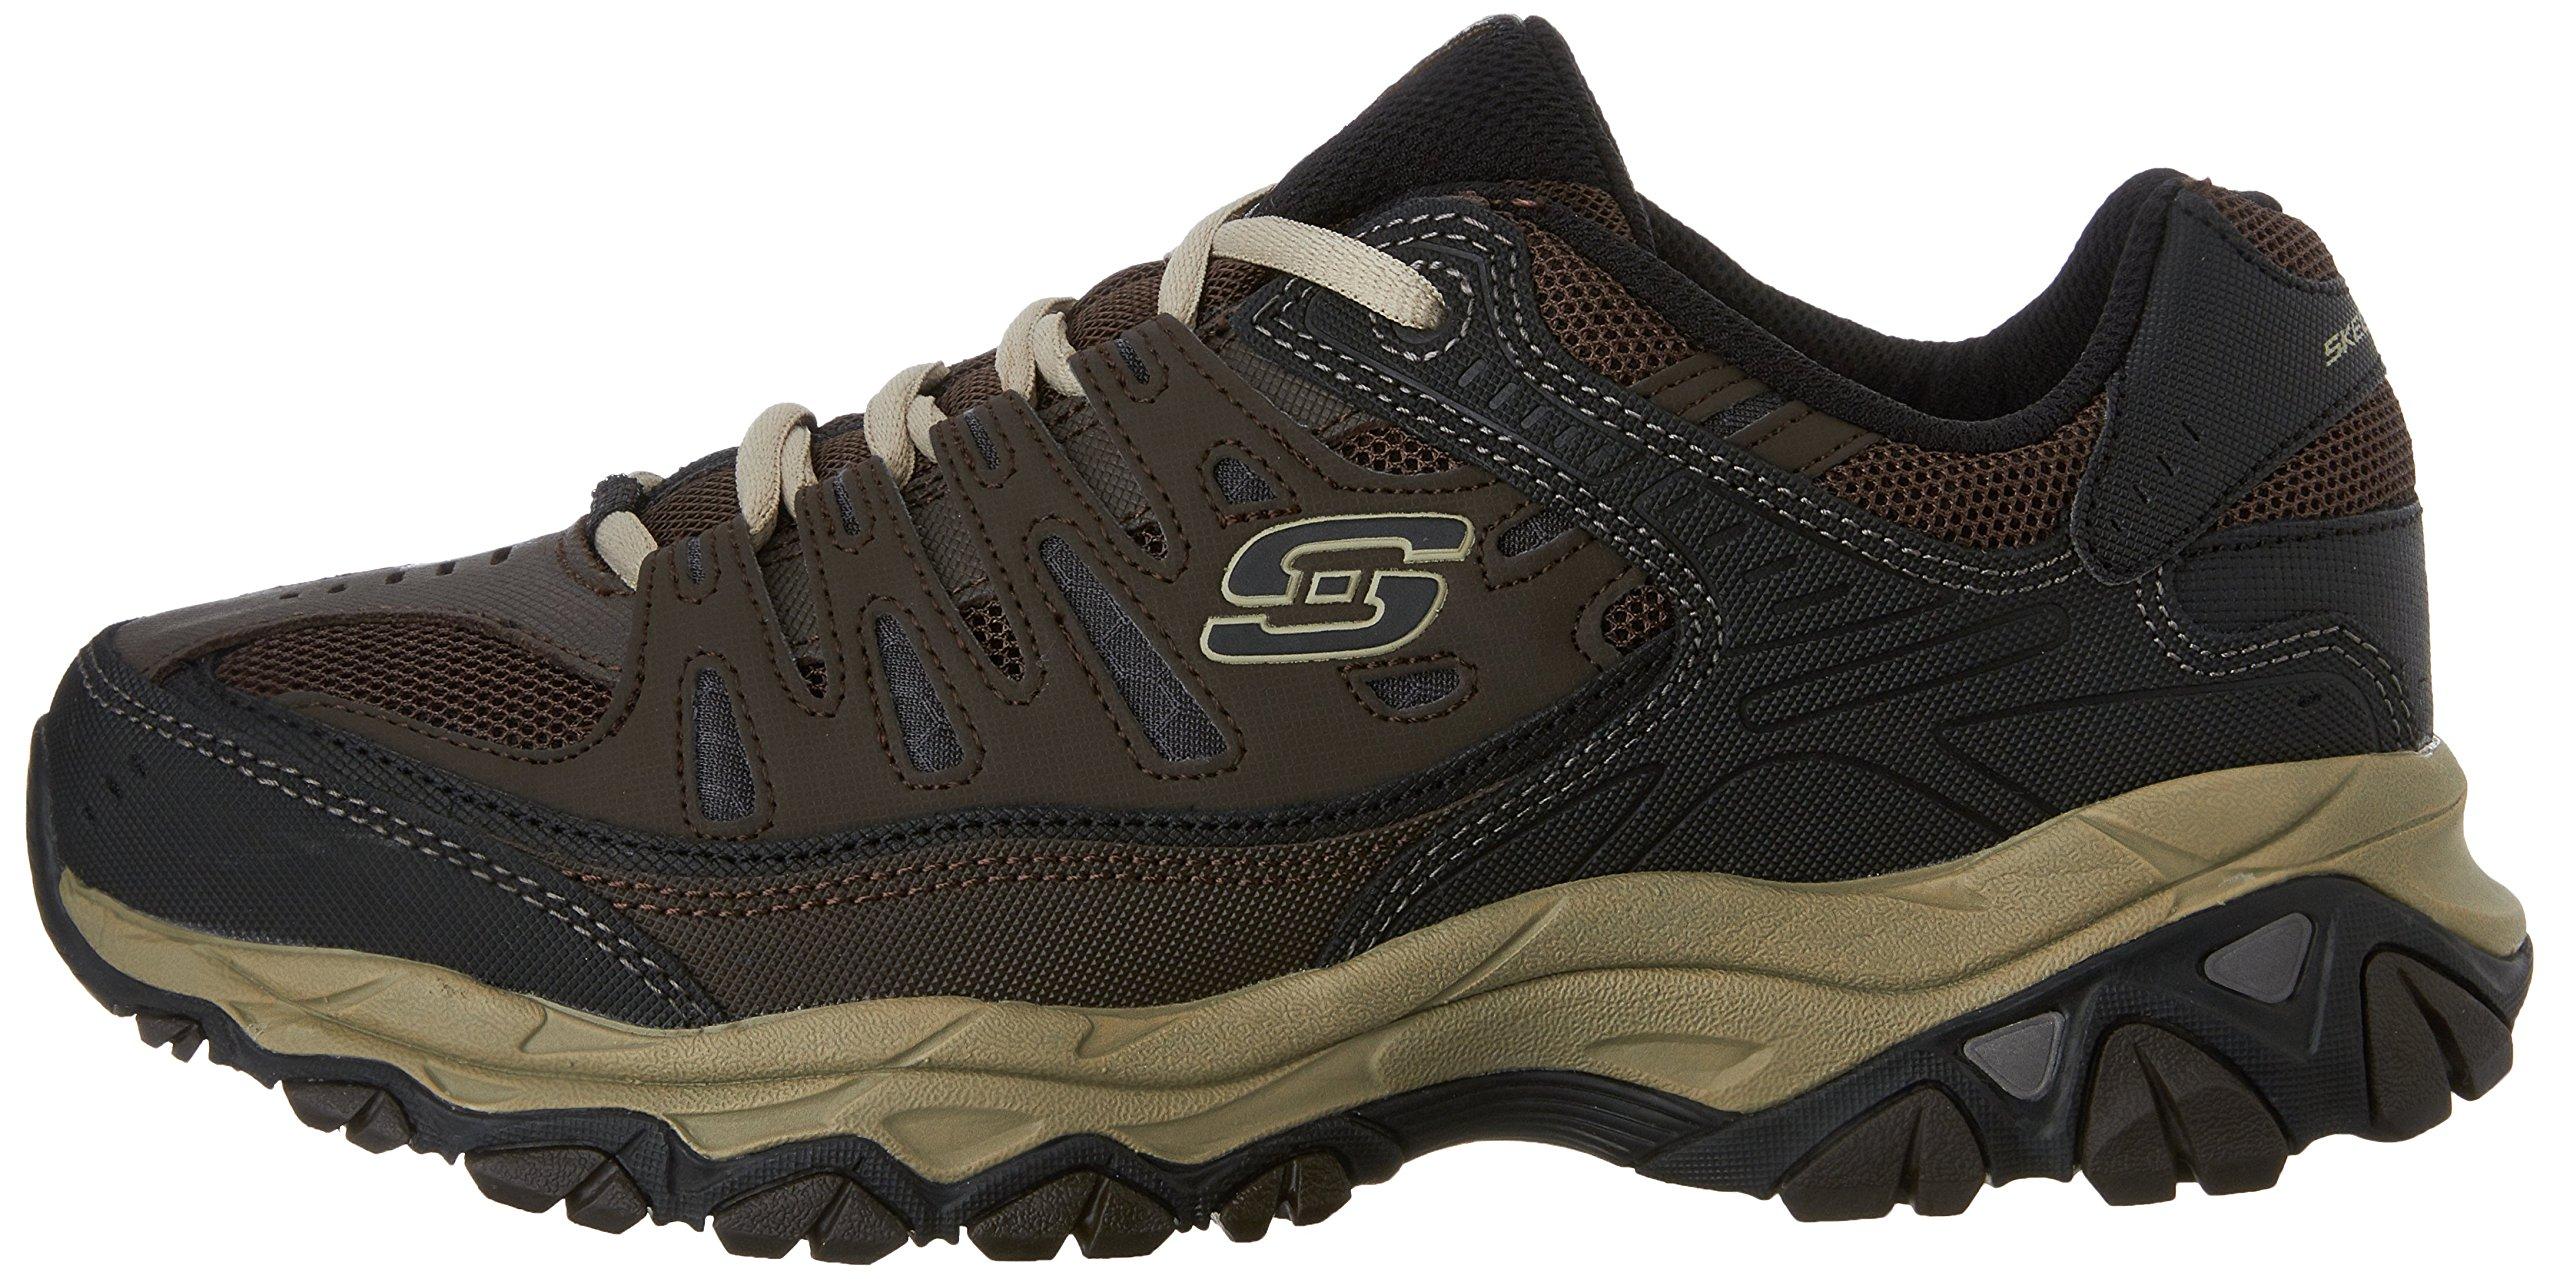 Skechers Men's AFTERBURNM.FIT Memory Foam Lace-Up Sneaker, Brown/Taupe, 7 M US by Skechers (Image #5)